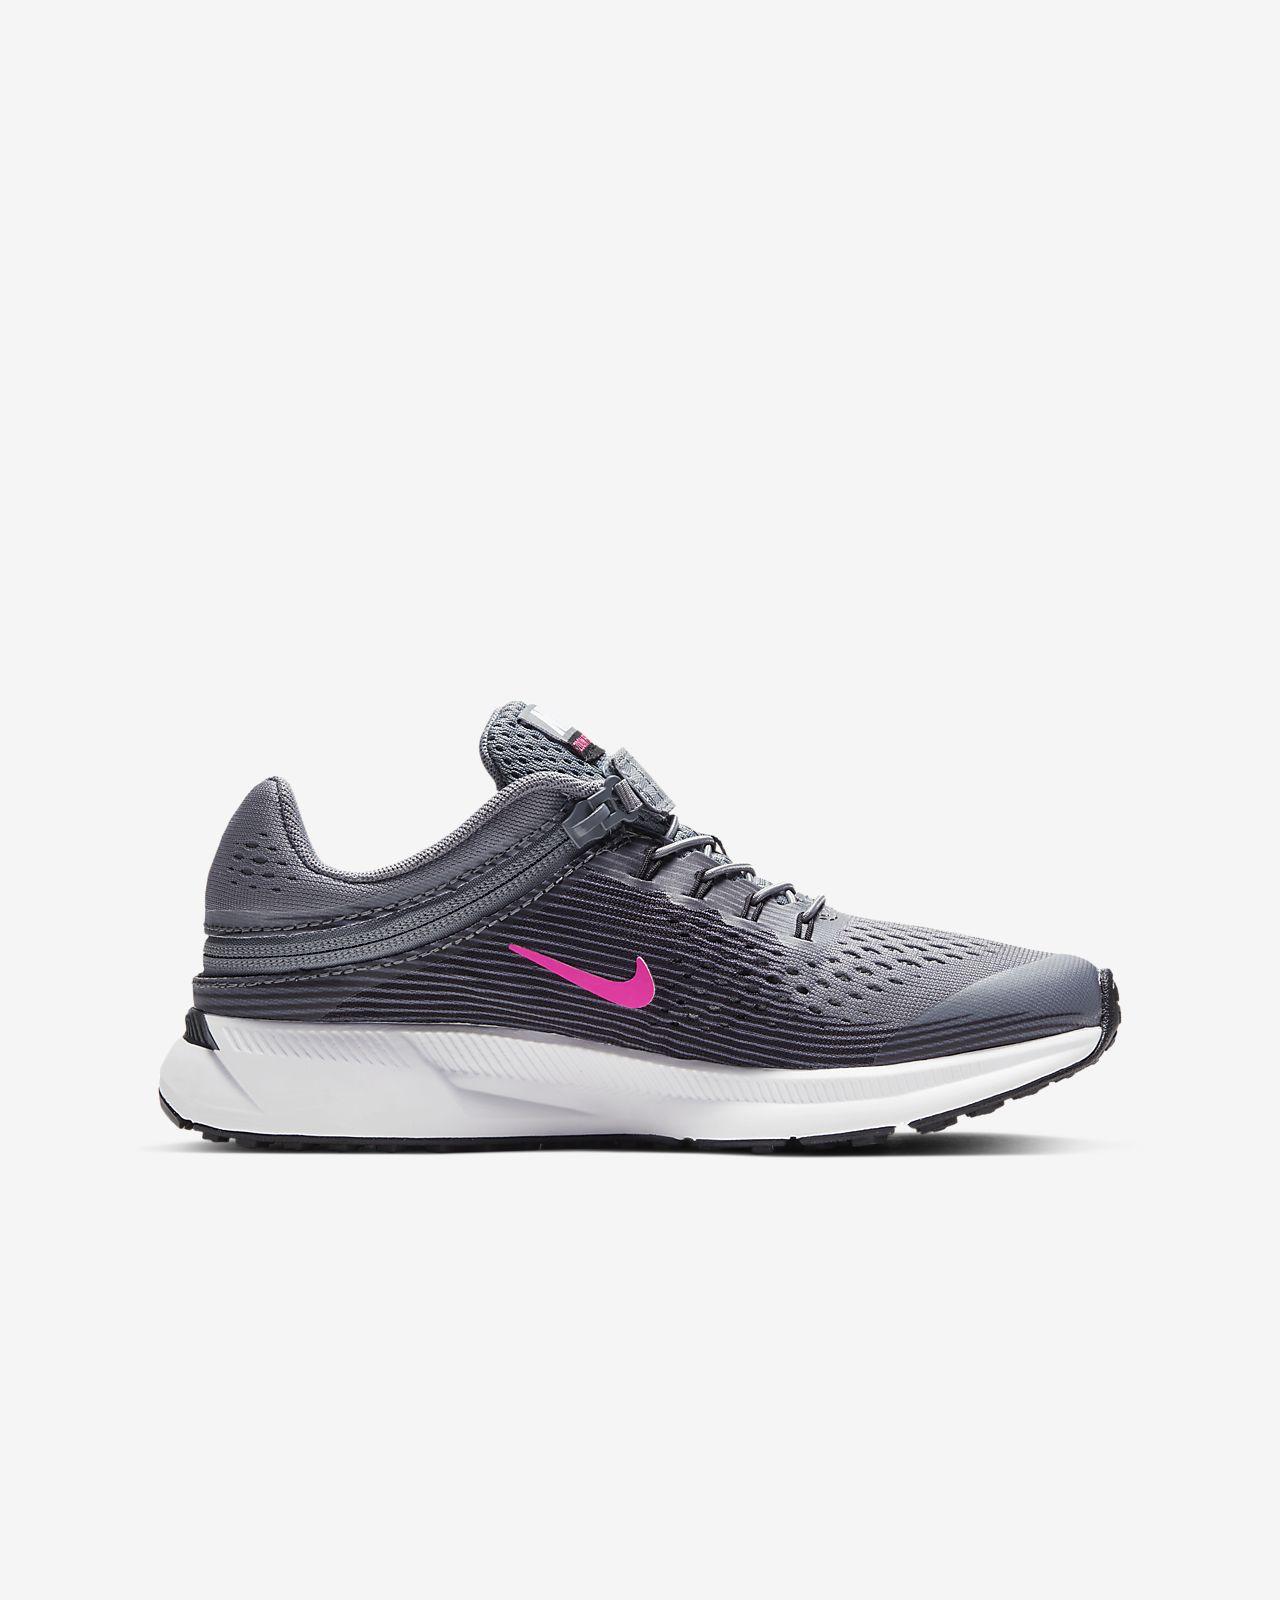 nouvelle collection 7c61d 4adad Nike Zoom Pegasus 34 FlyEase Younger/Older Kids' Running Shoe